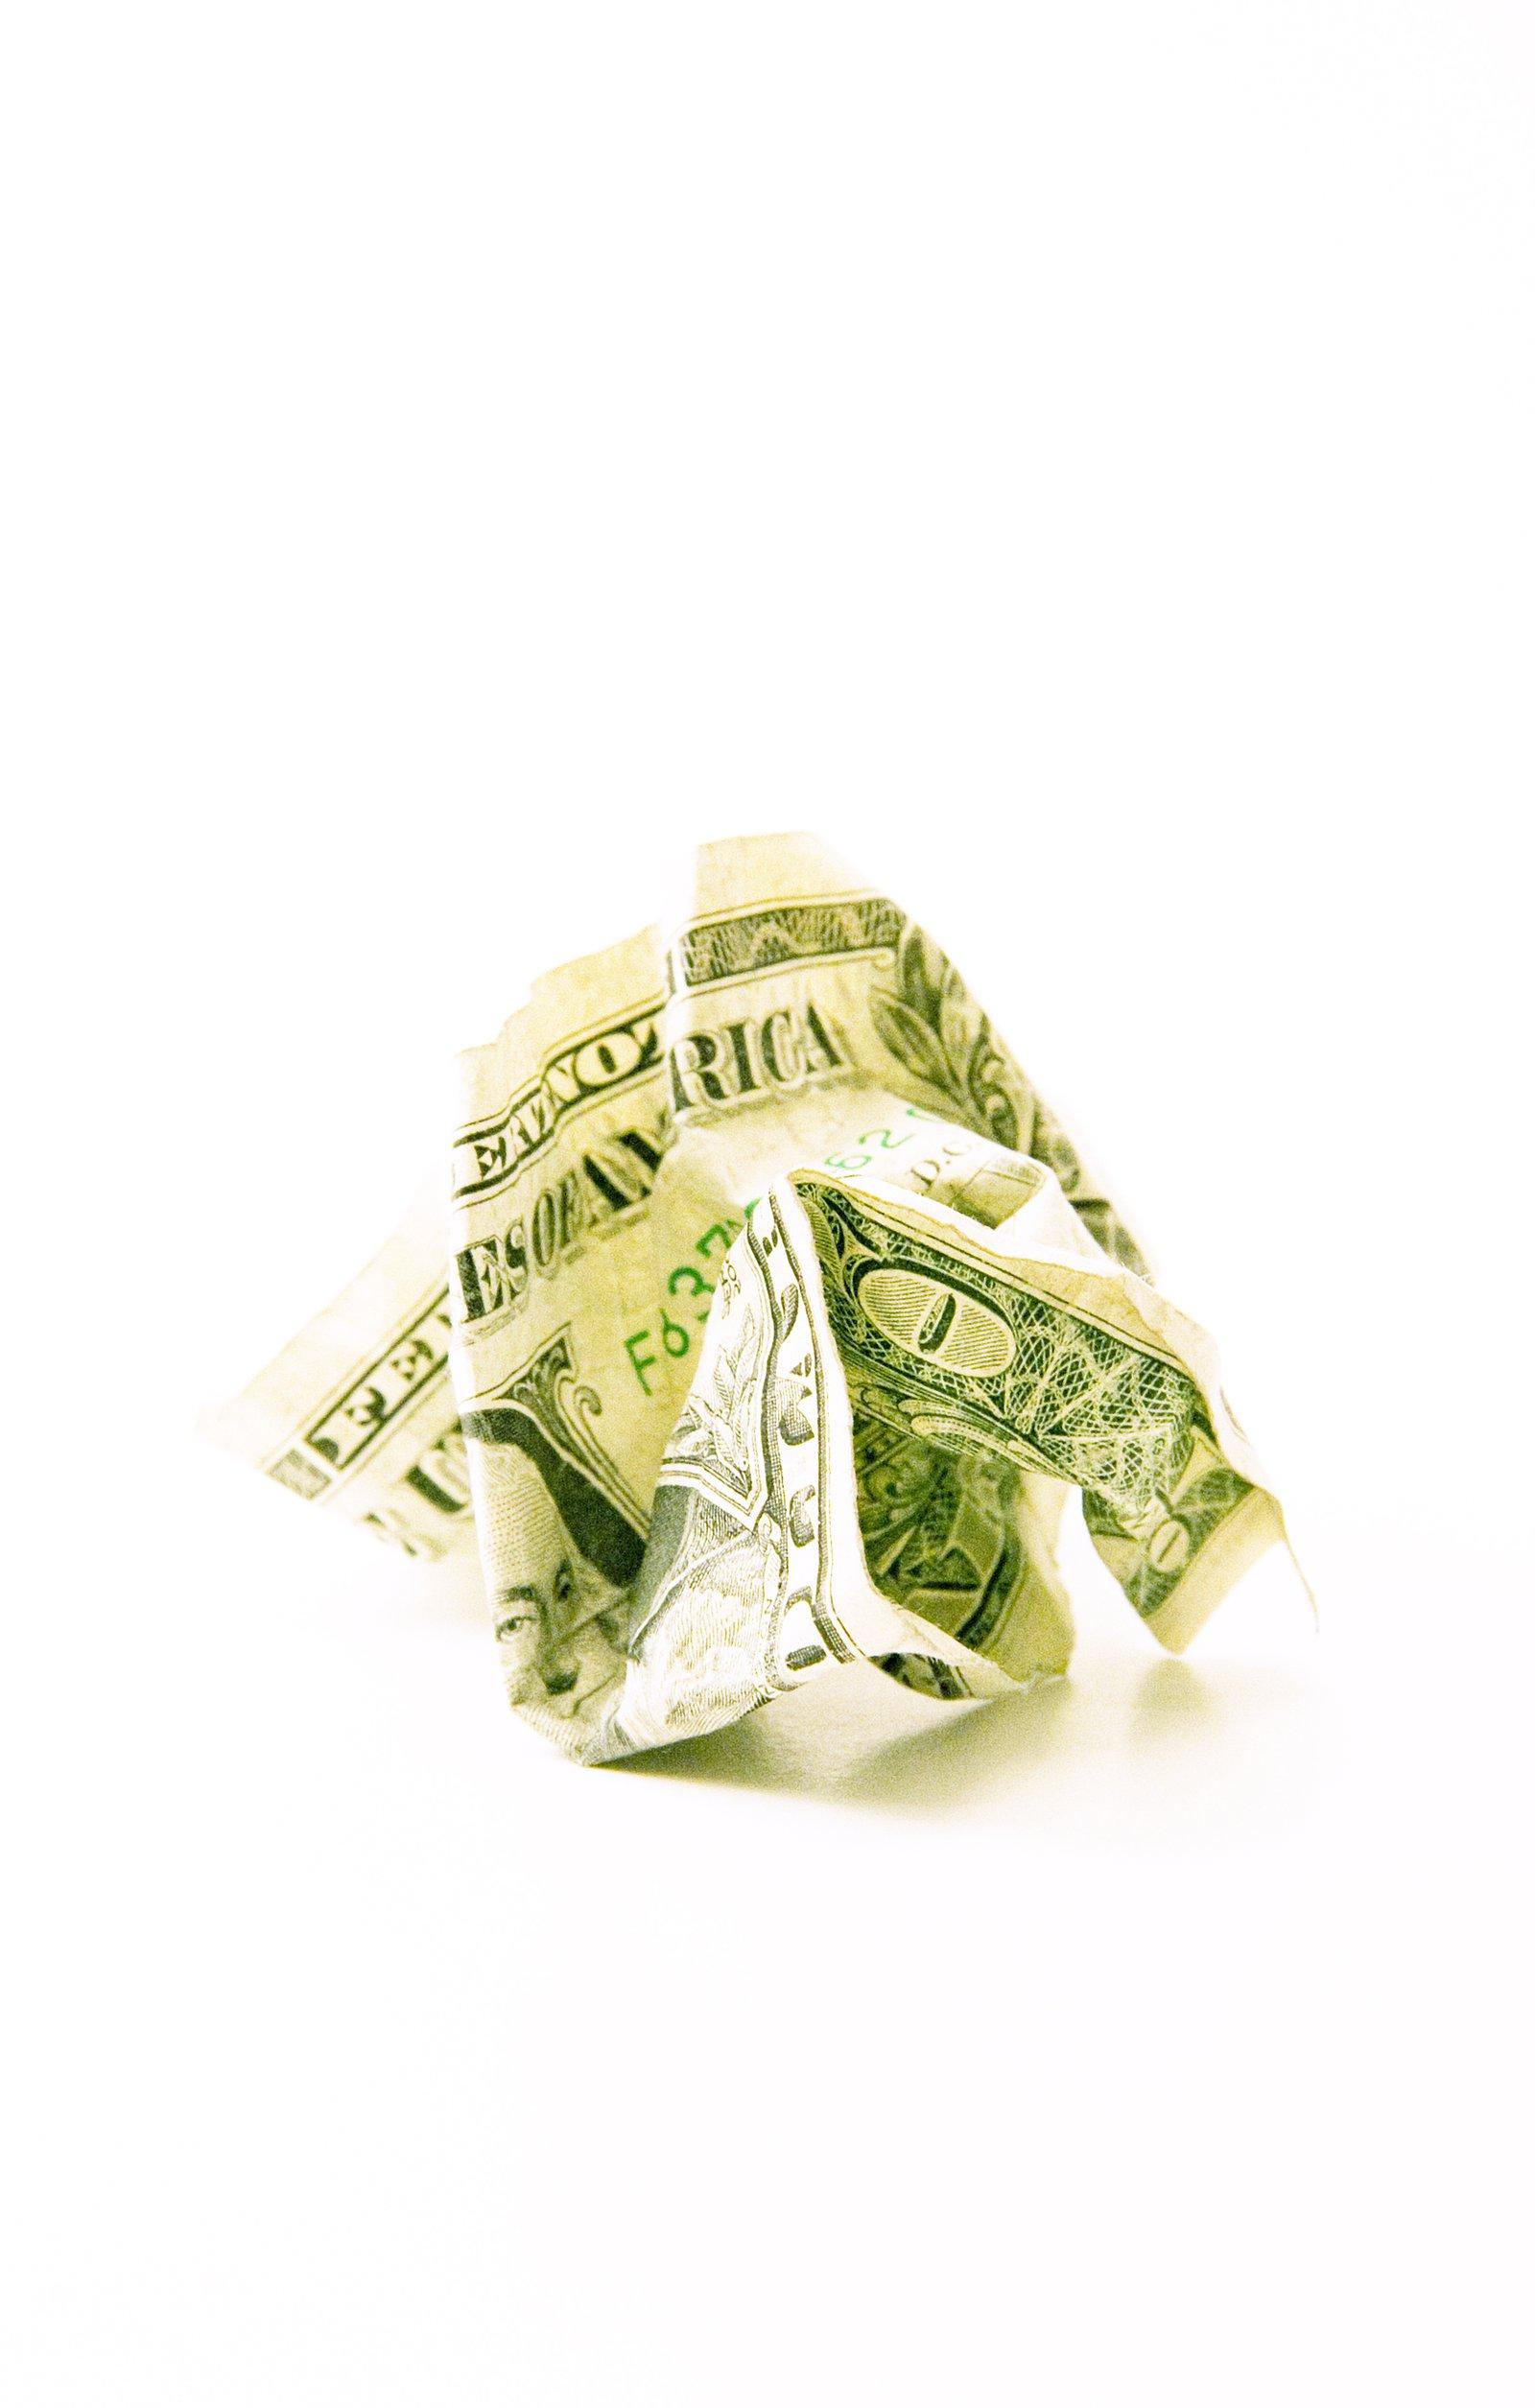 Crumpled Income.